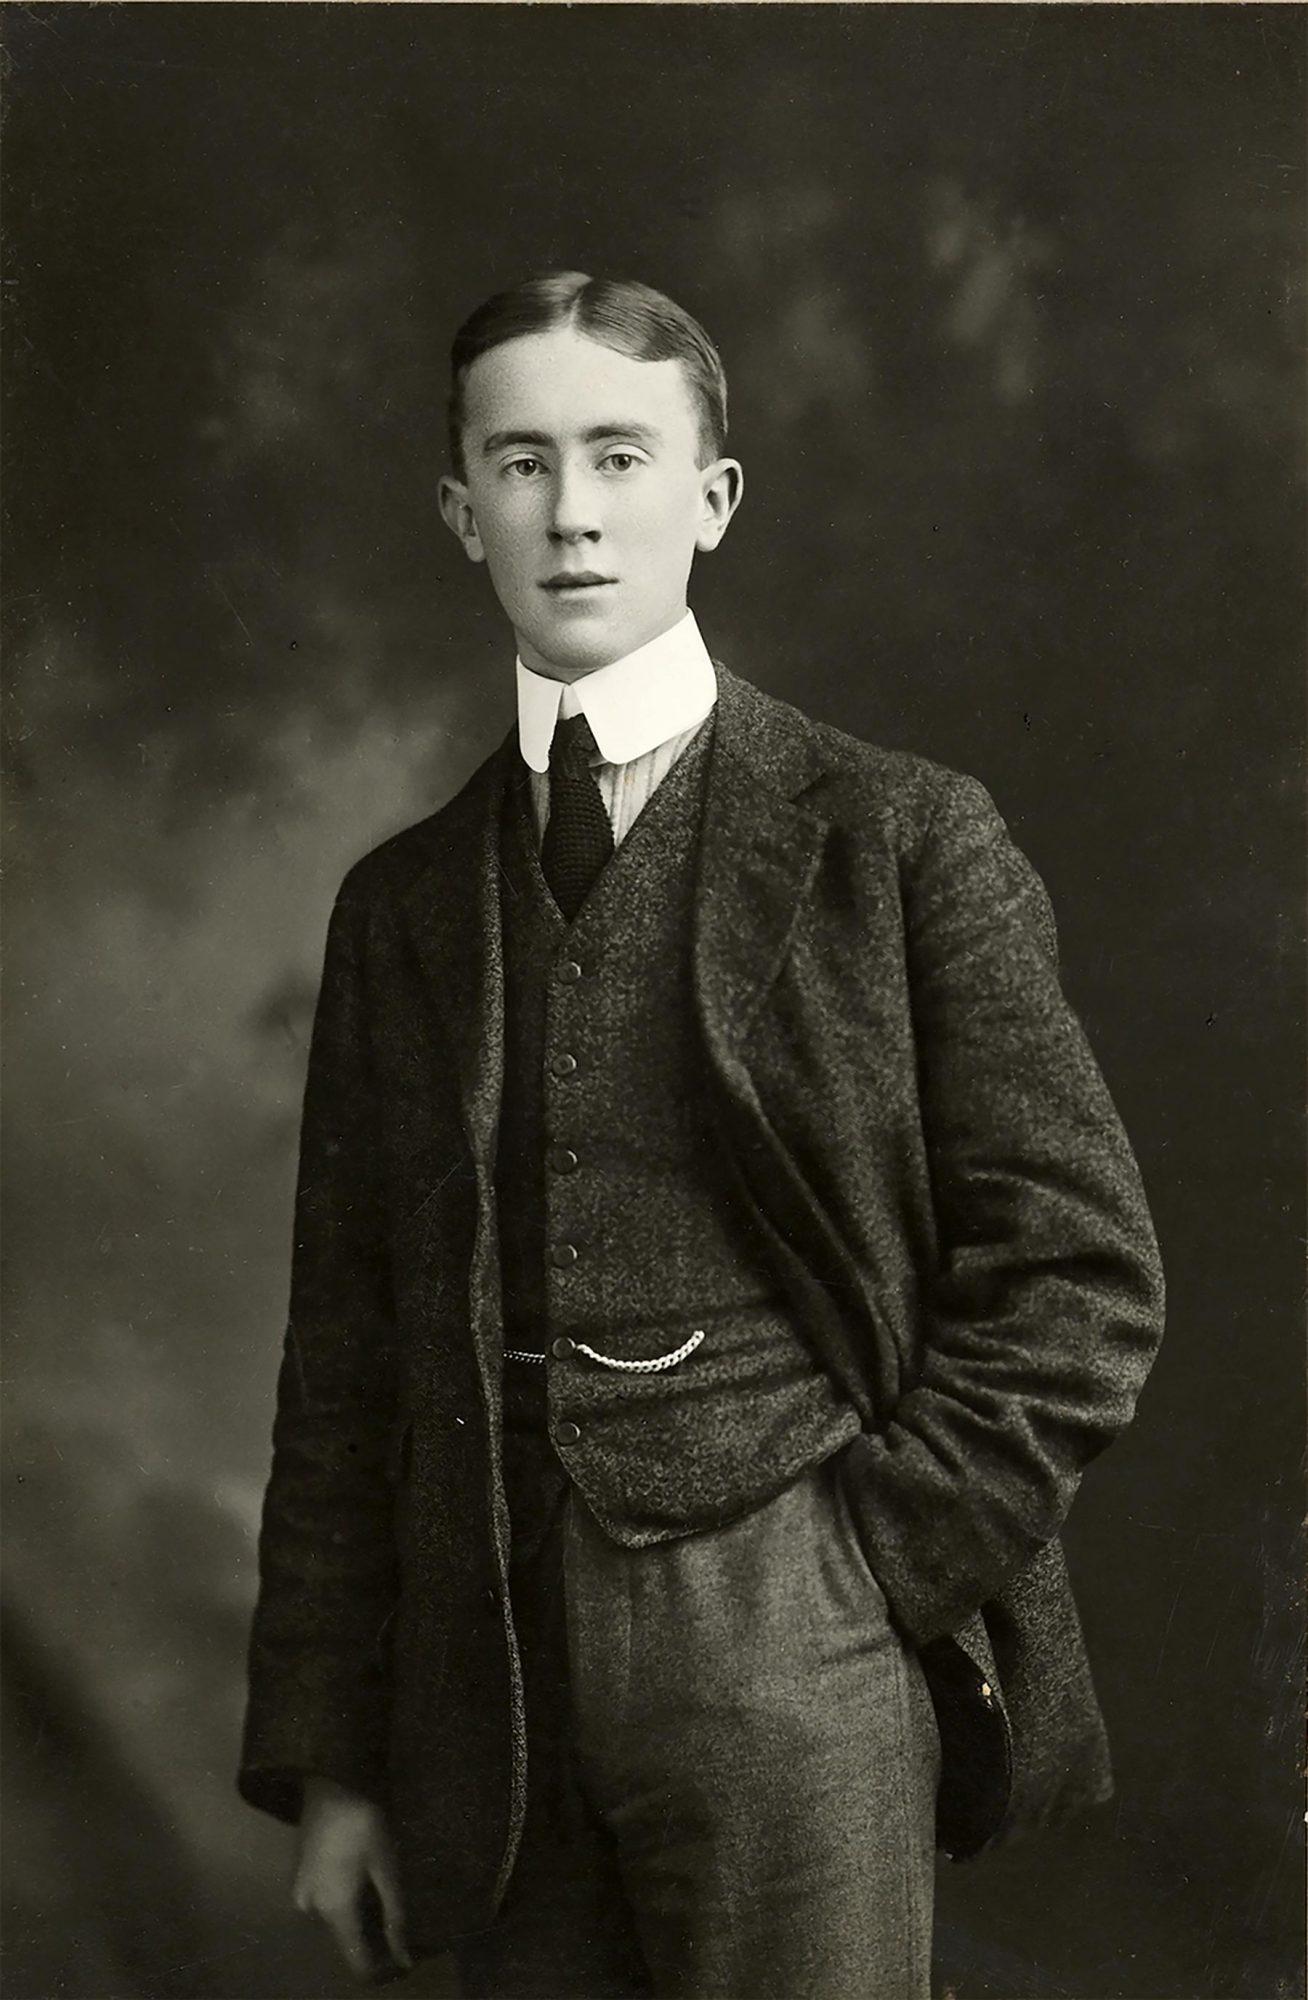 JRRT-aged-19